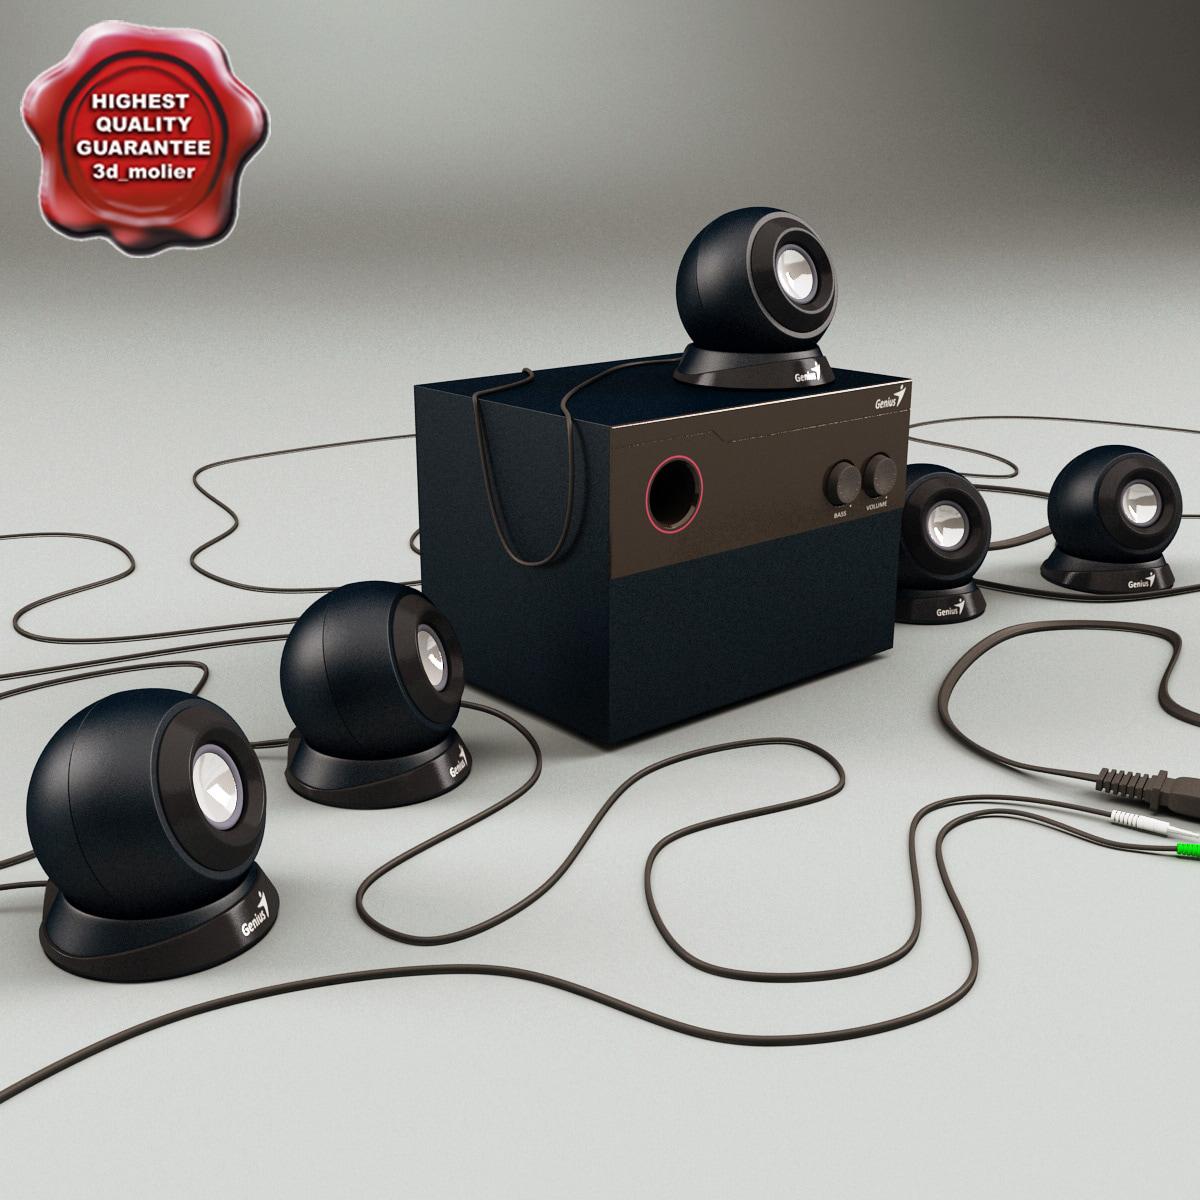 Speaker_System_Genius_5_1_00.jpg